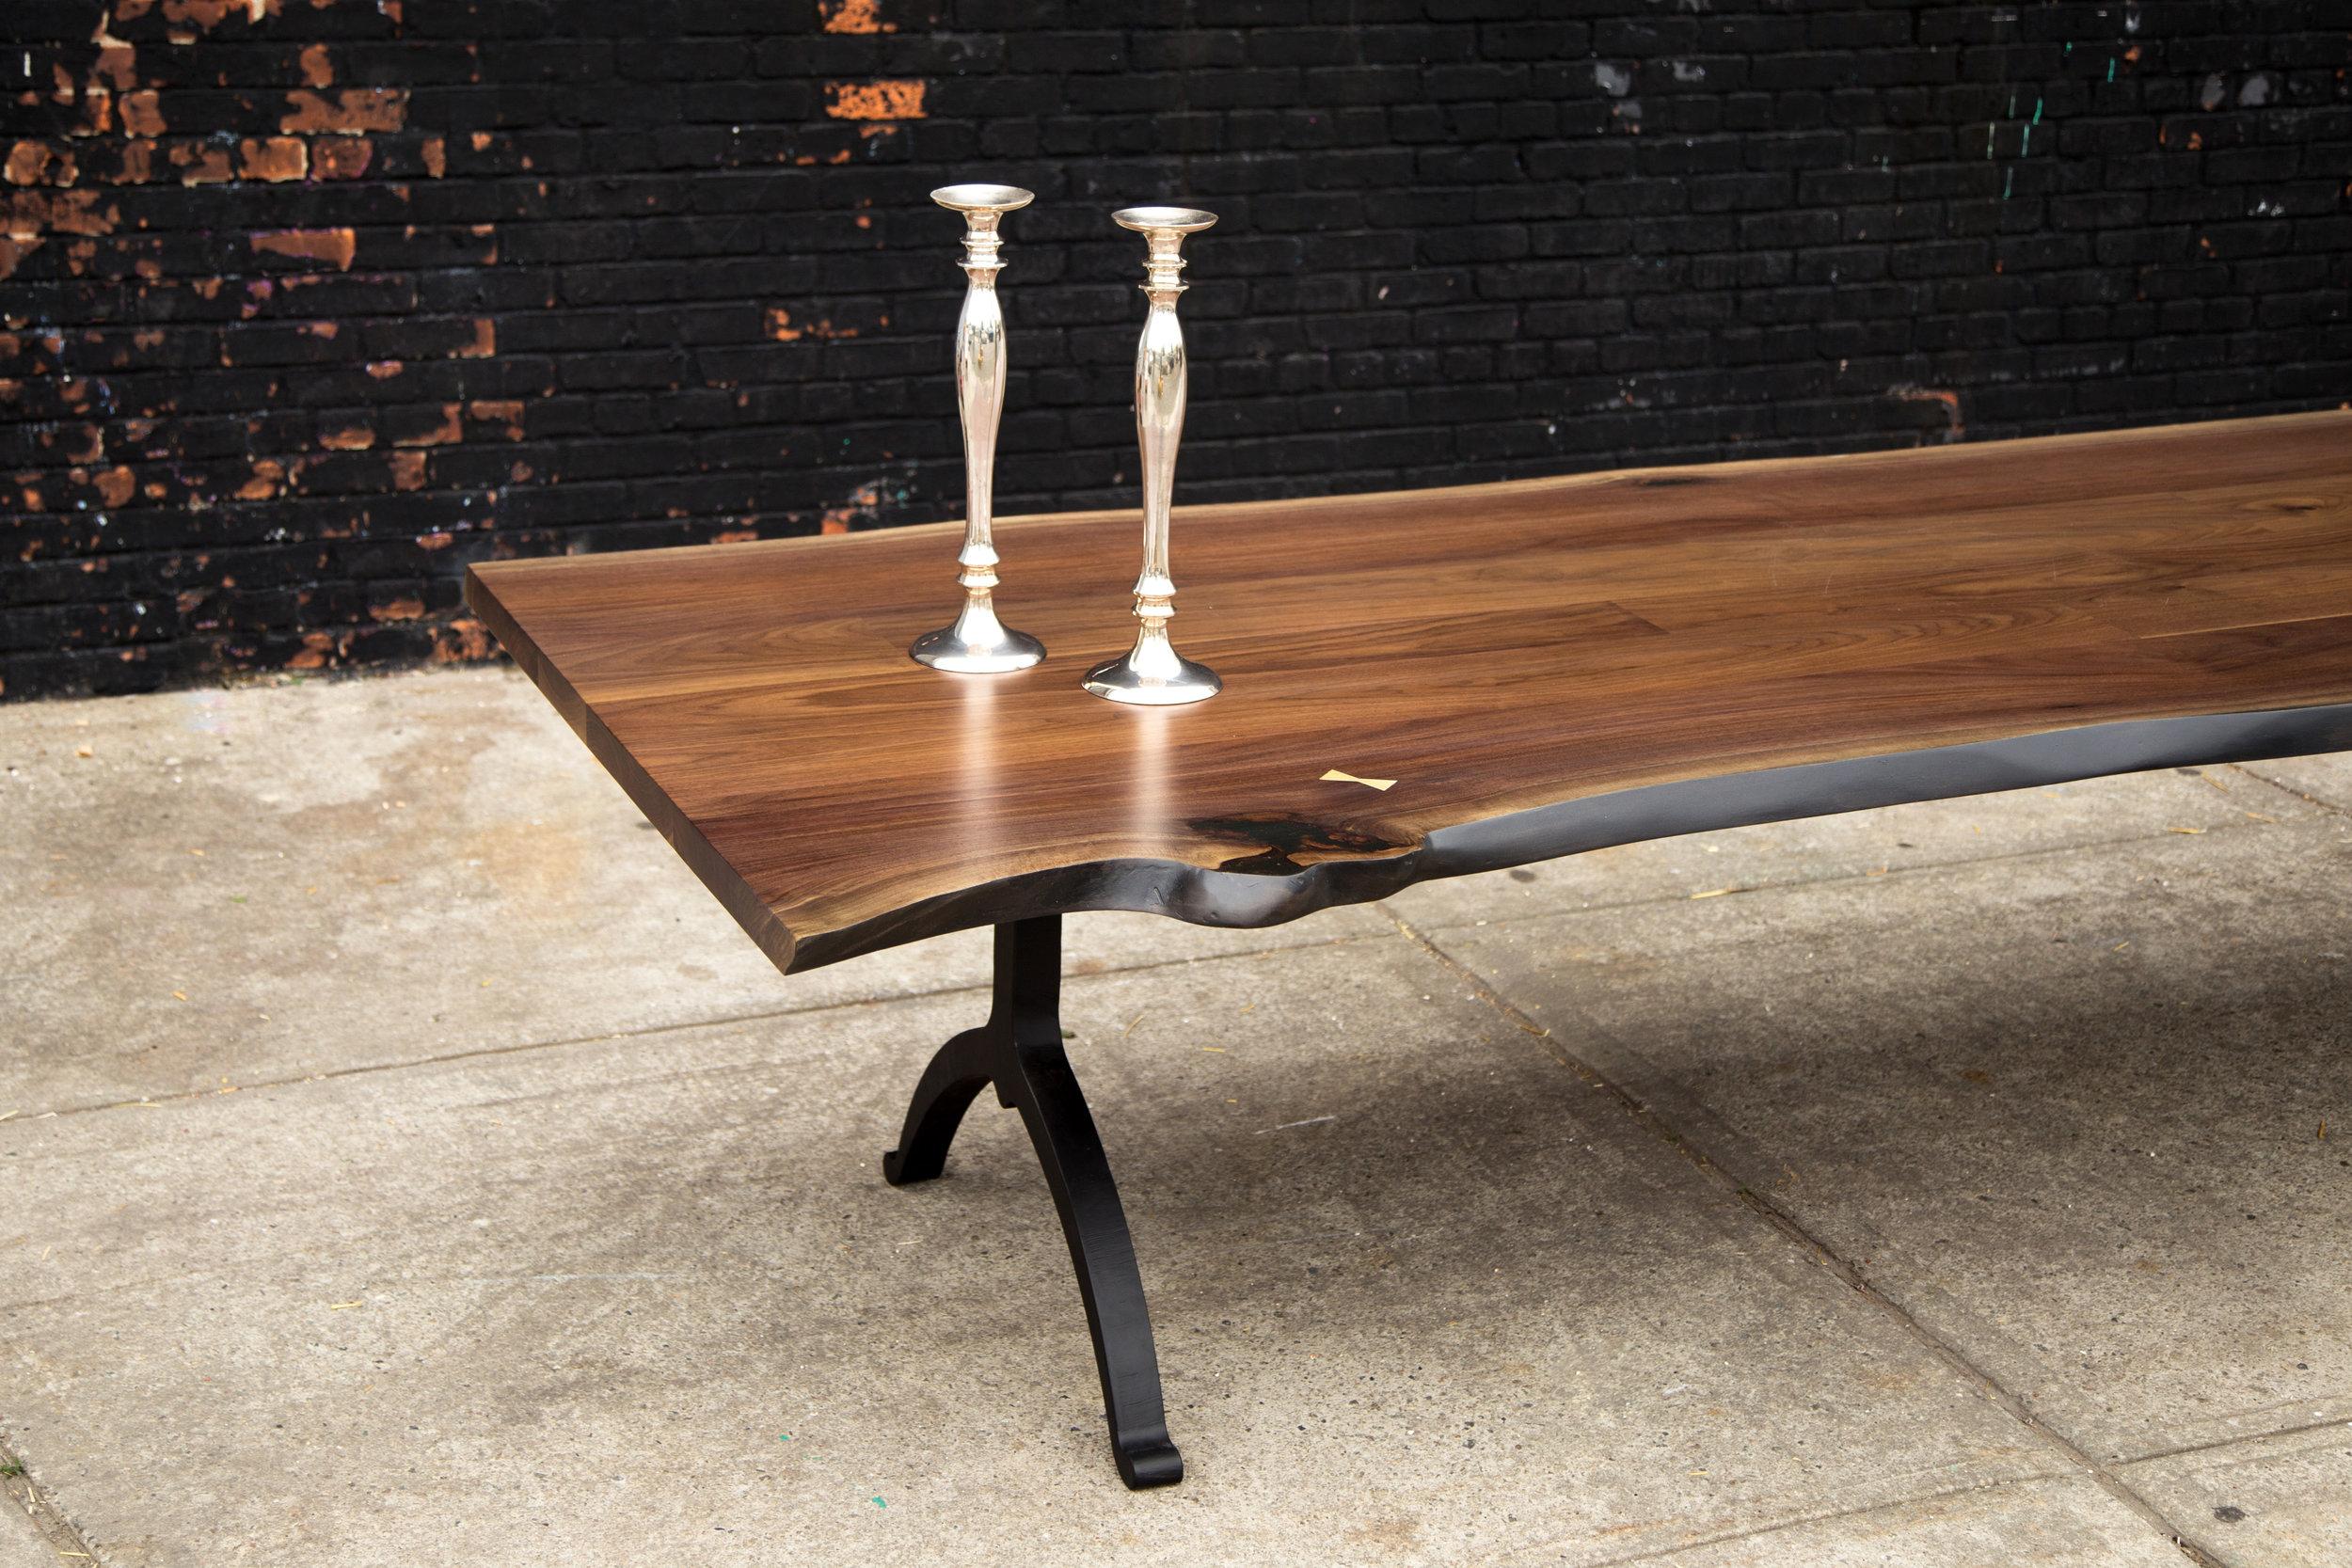 Live edge table with blackened steel legs